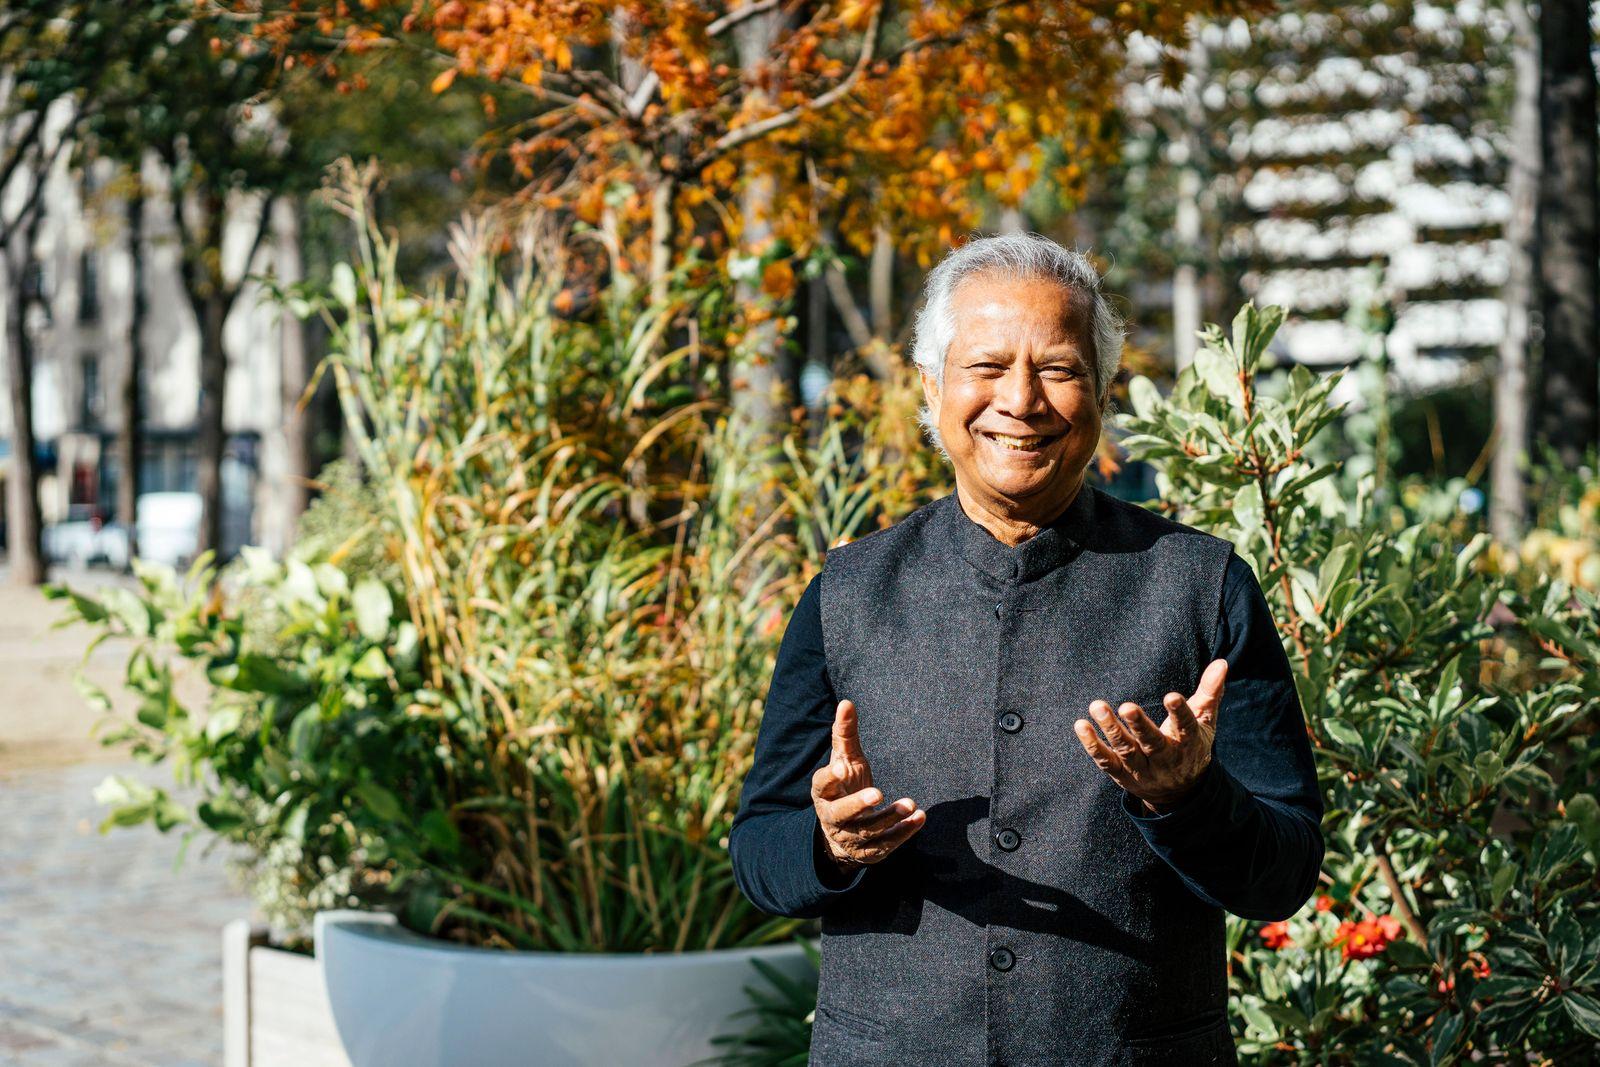 Muhammad Yunus, Nobel Peace Prize laureate. Muhammad Yunus, laurà at du prix Nobel de la paix. Muhammad Yunus, Nobel Pea